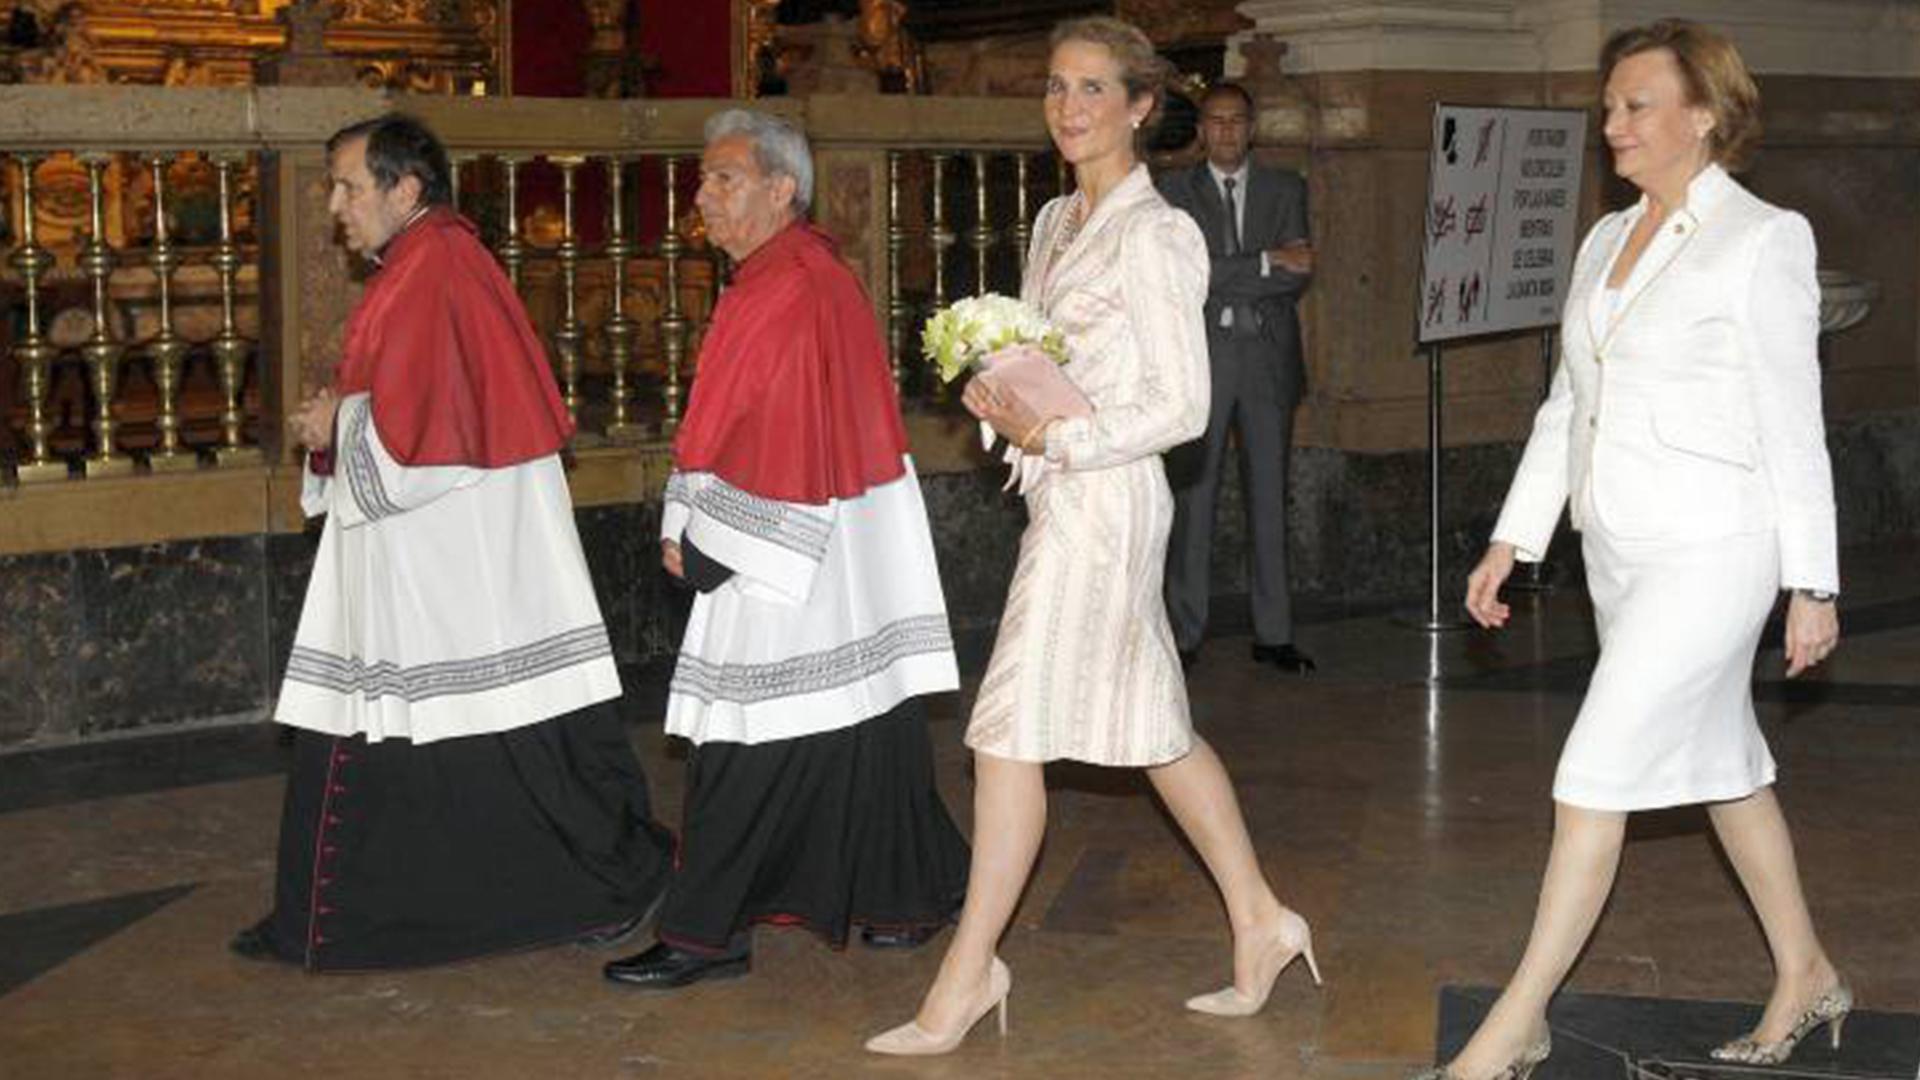 RMCZ visita Infanta Elena 2014 03